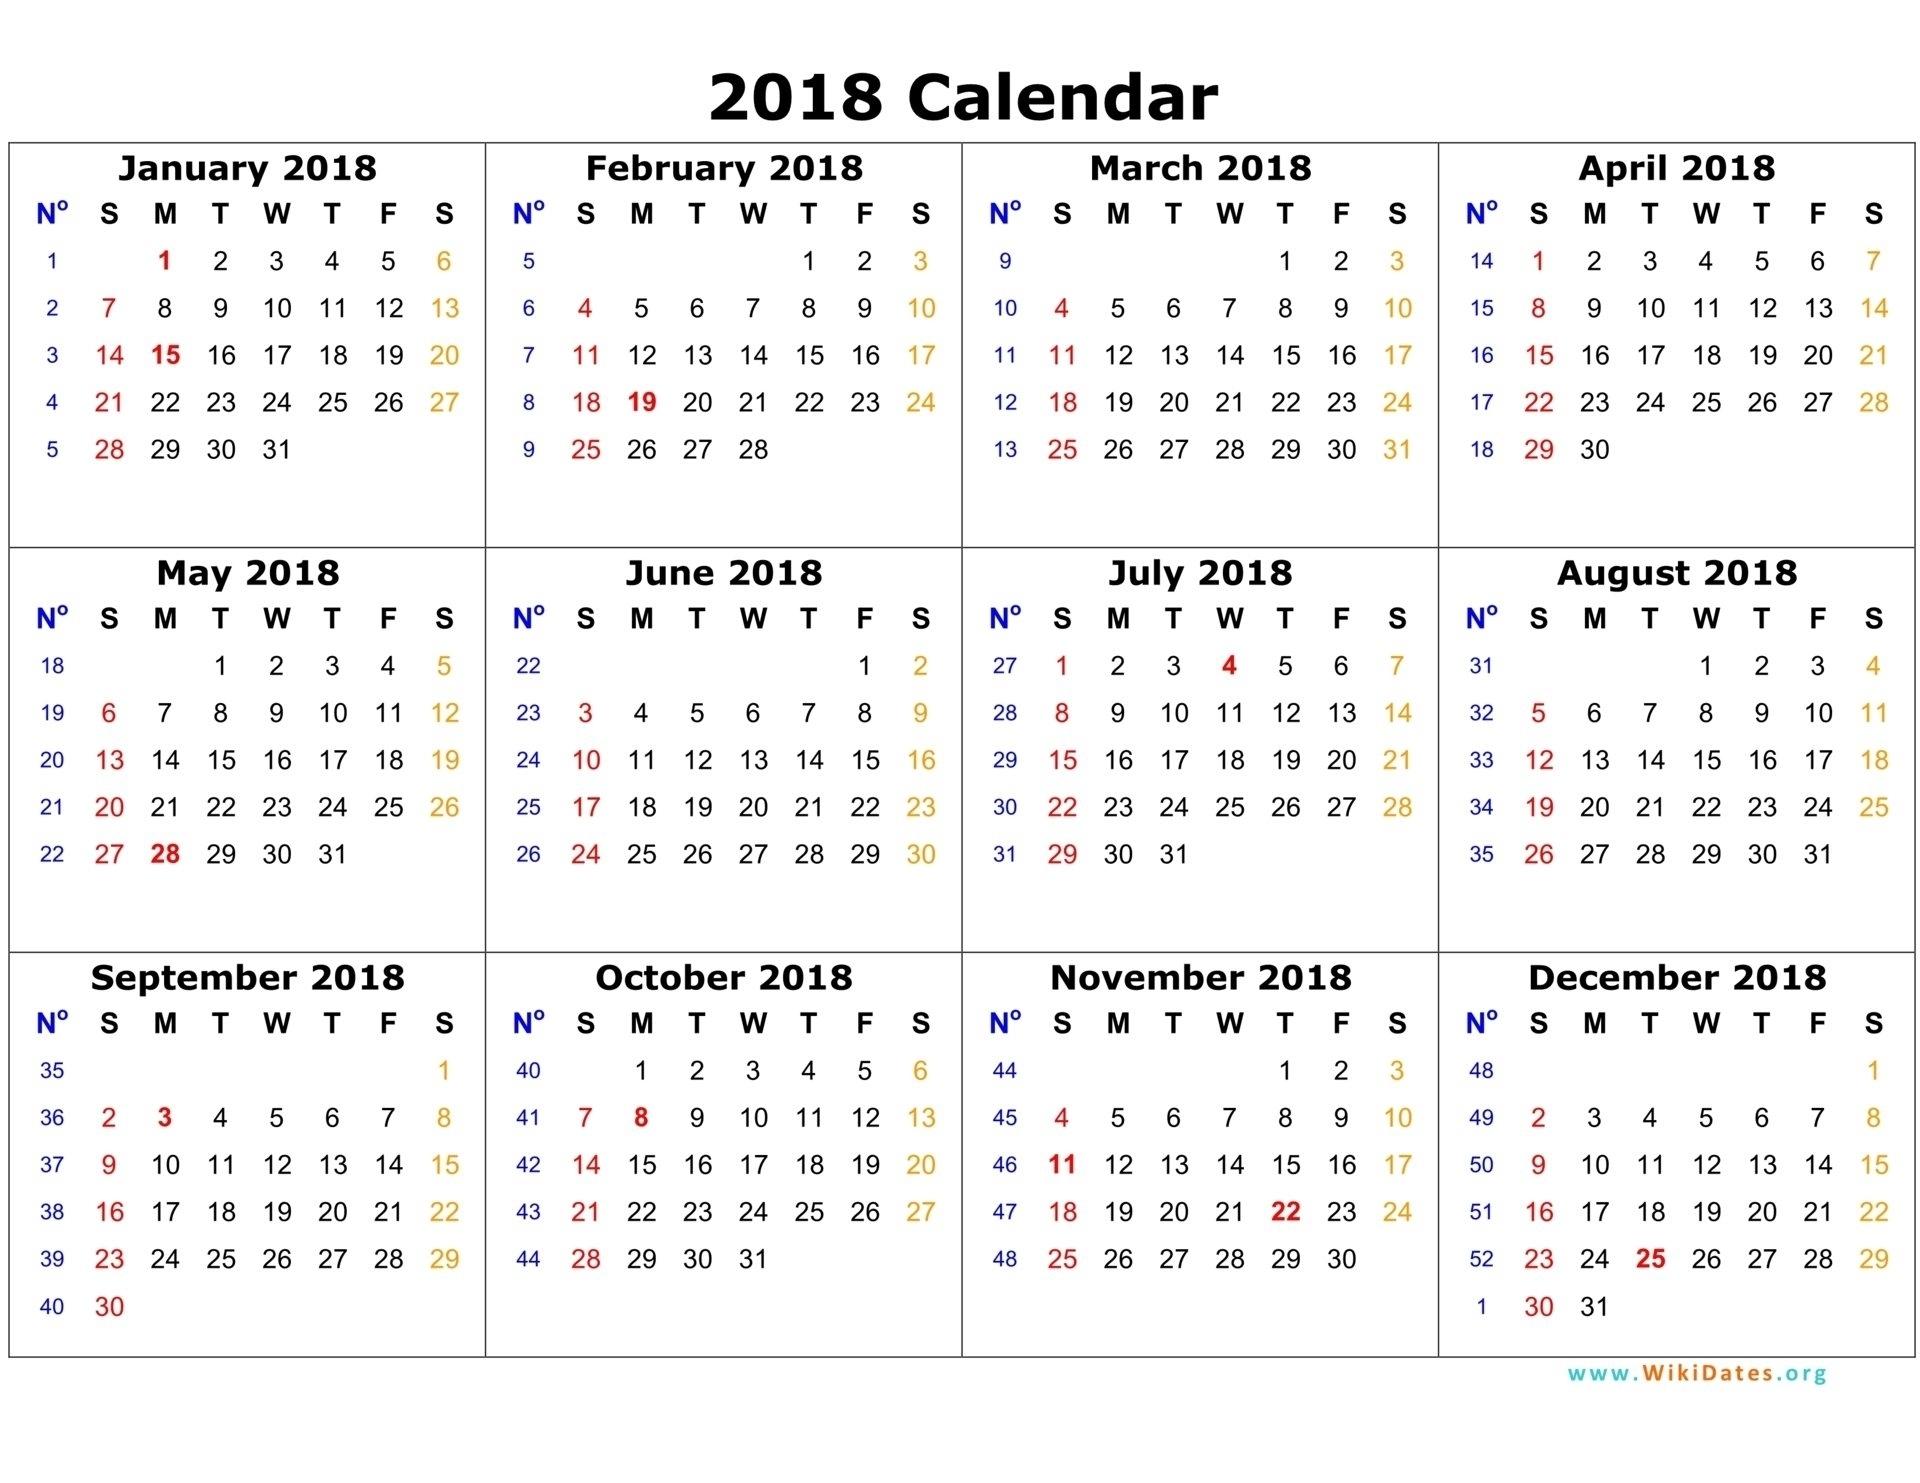 Printable Calendar 2018 - Free 2018 Blank Calendar Template